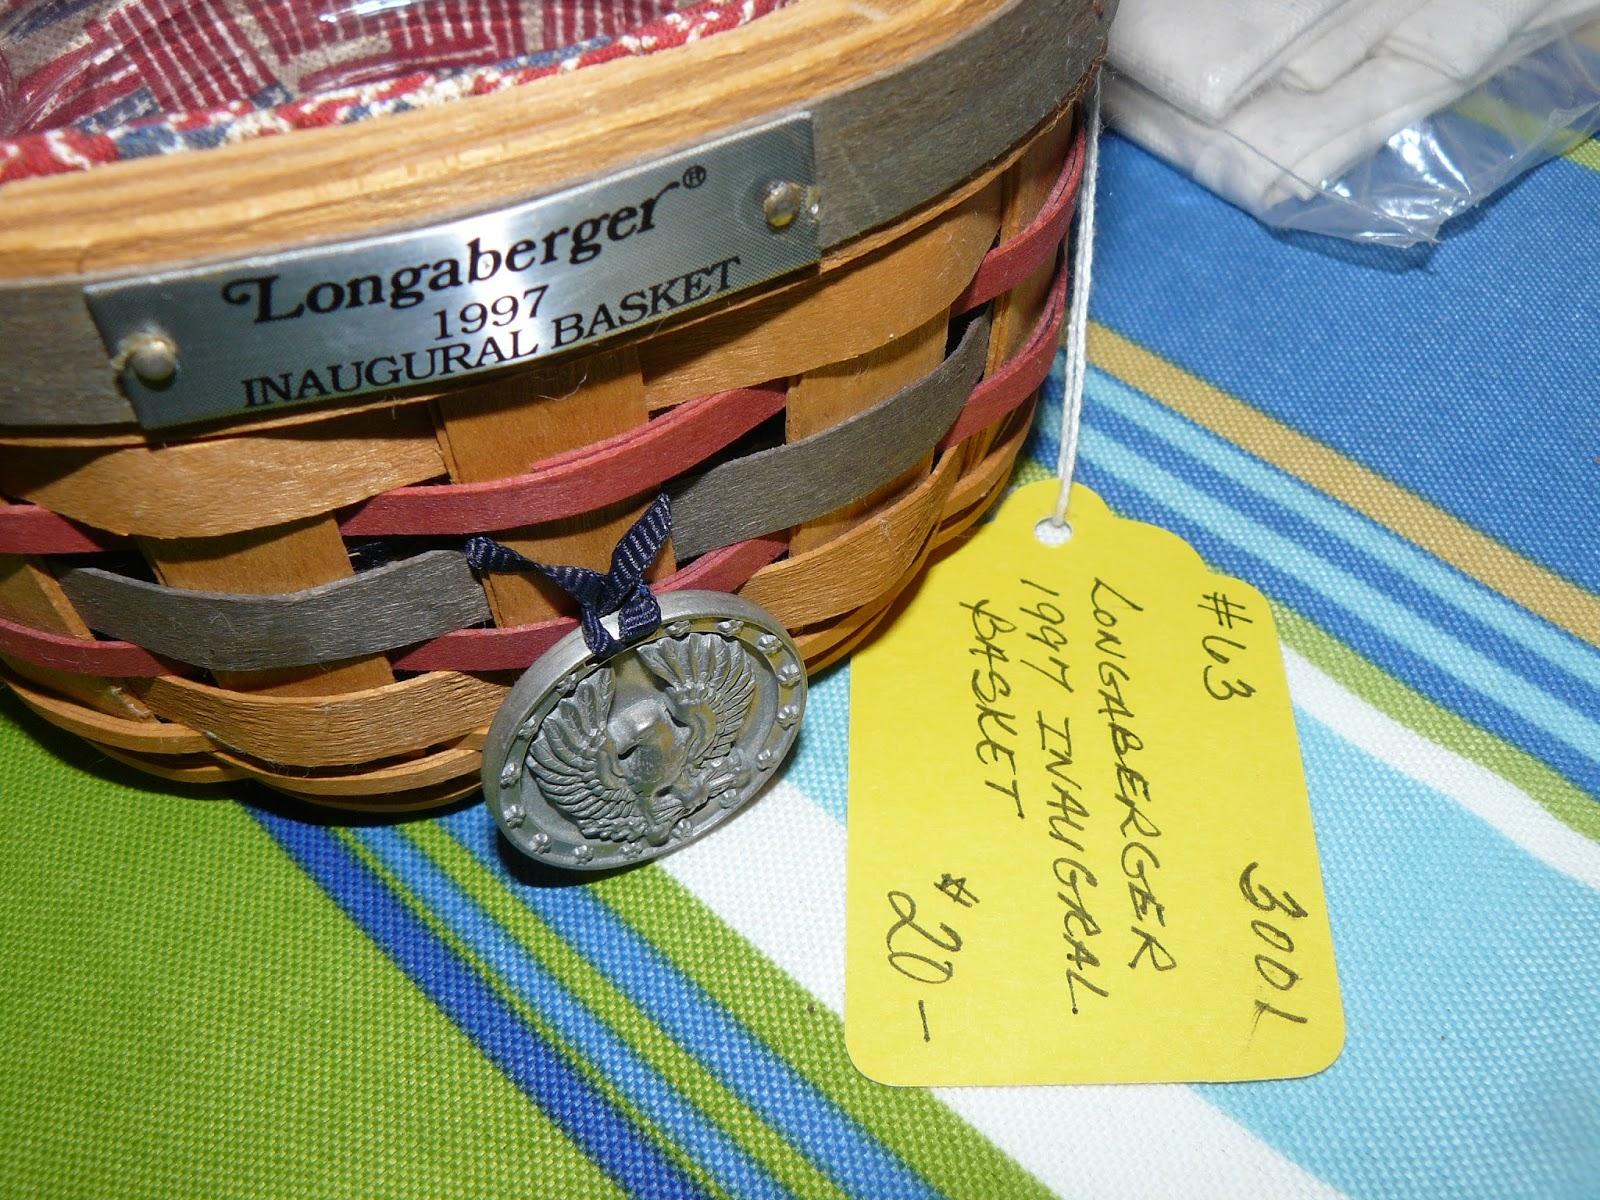 SCRANBERRY COOP : Longaberger Baskets, 1997 Inaugural ...